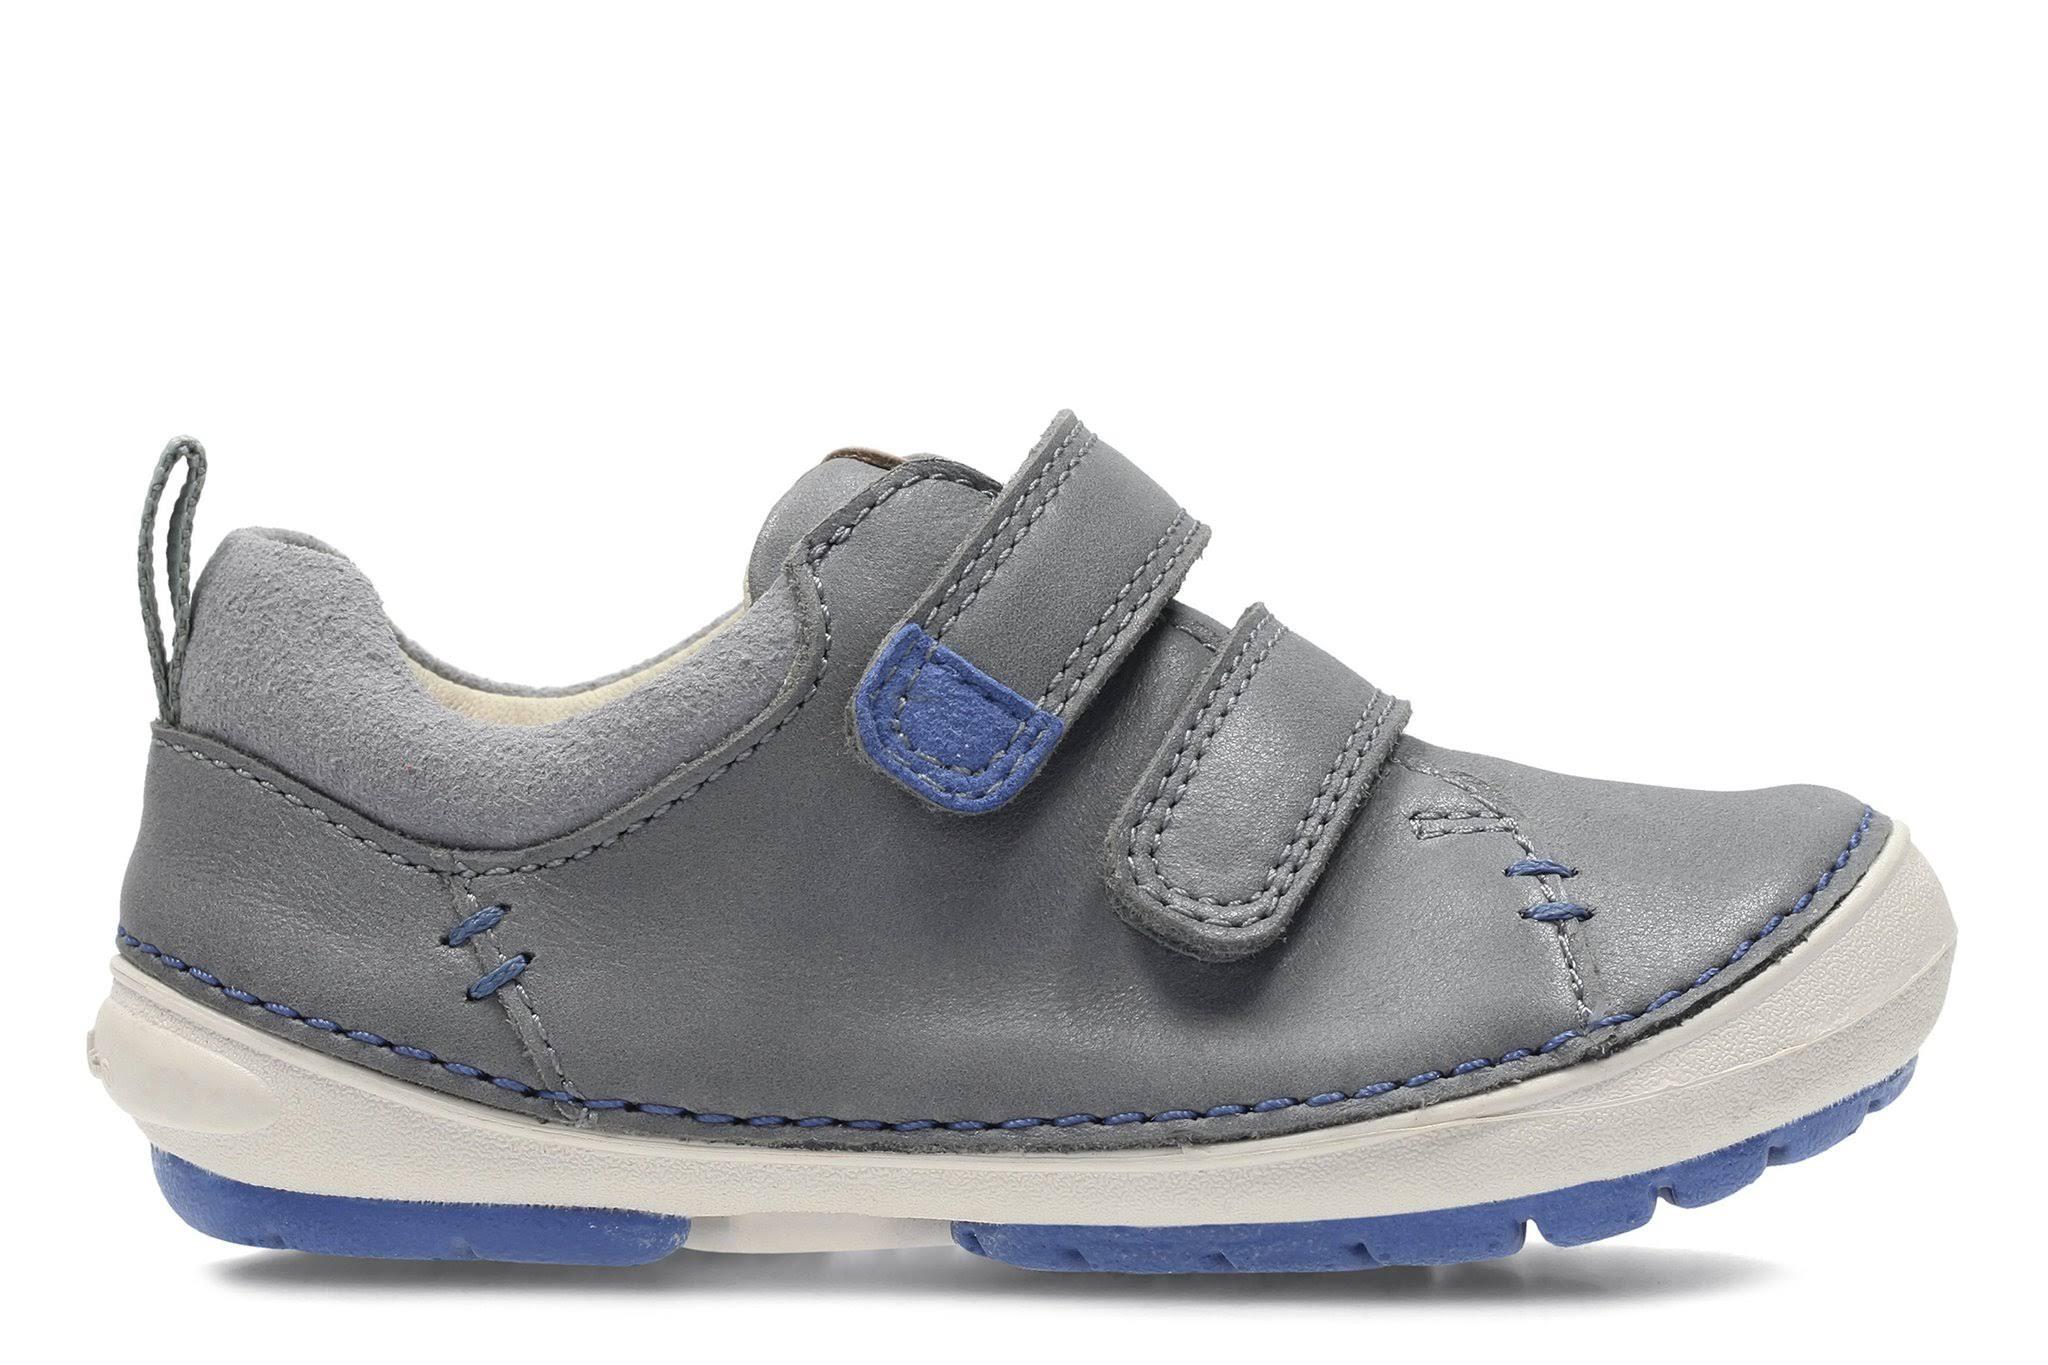 First lederen Clarks schoenen fit grijs 6 in Softly breed Toby maat ordxeCBW